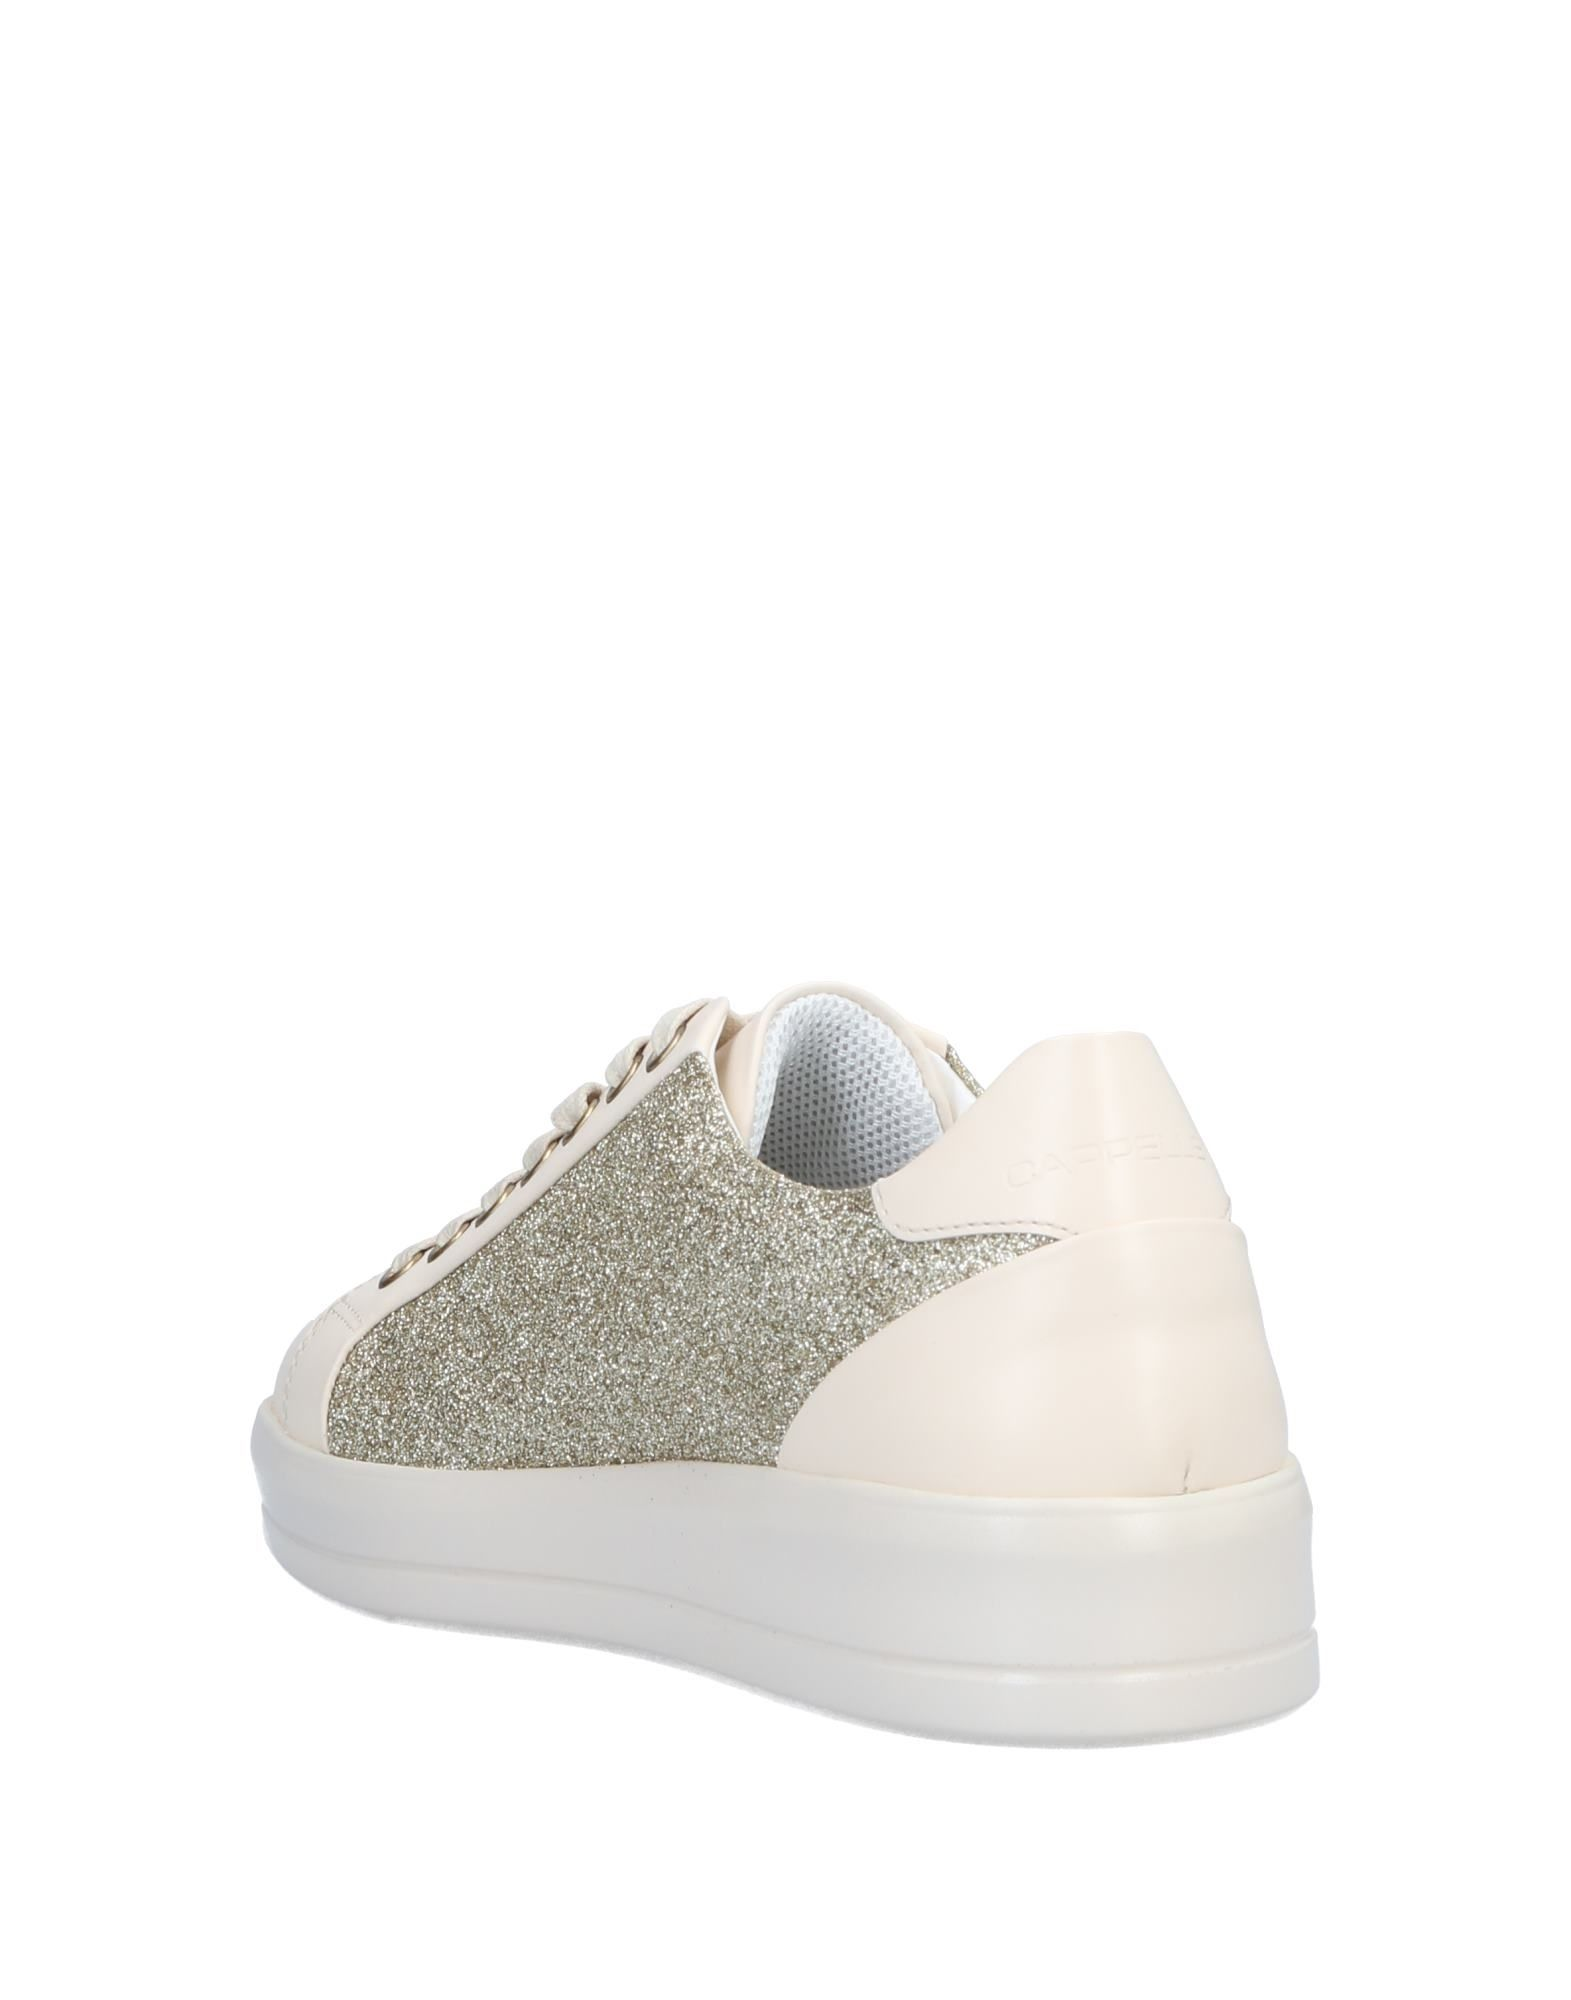 Cappelletti Sneakers Damen Damen Sneakers  11517184ER bc6fc9